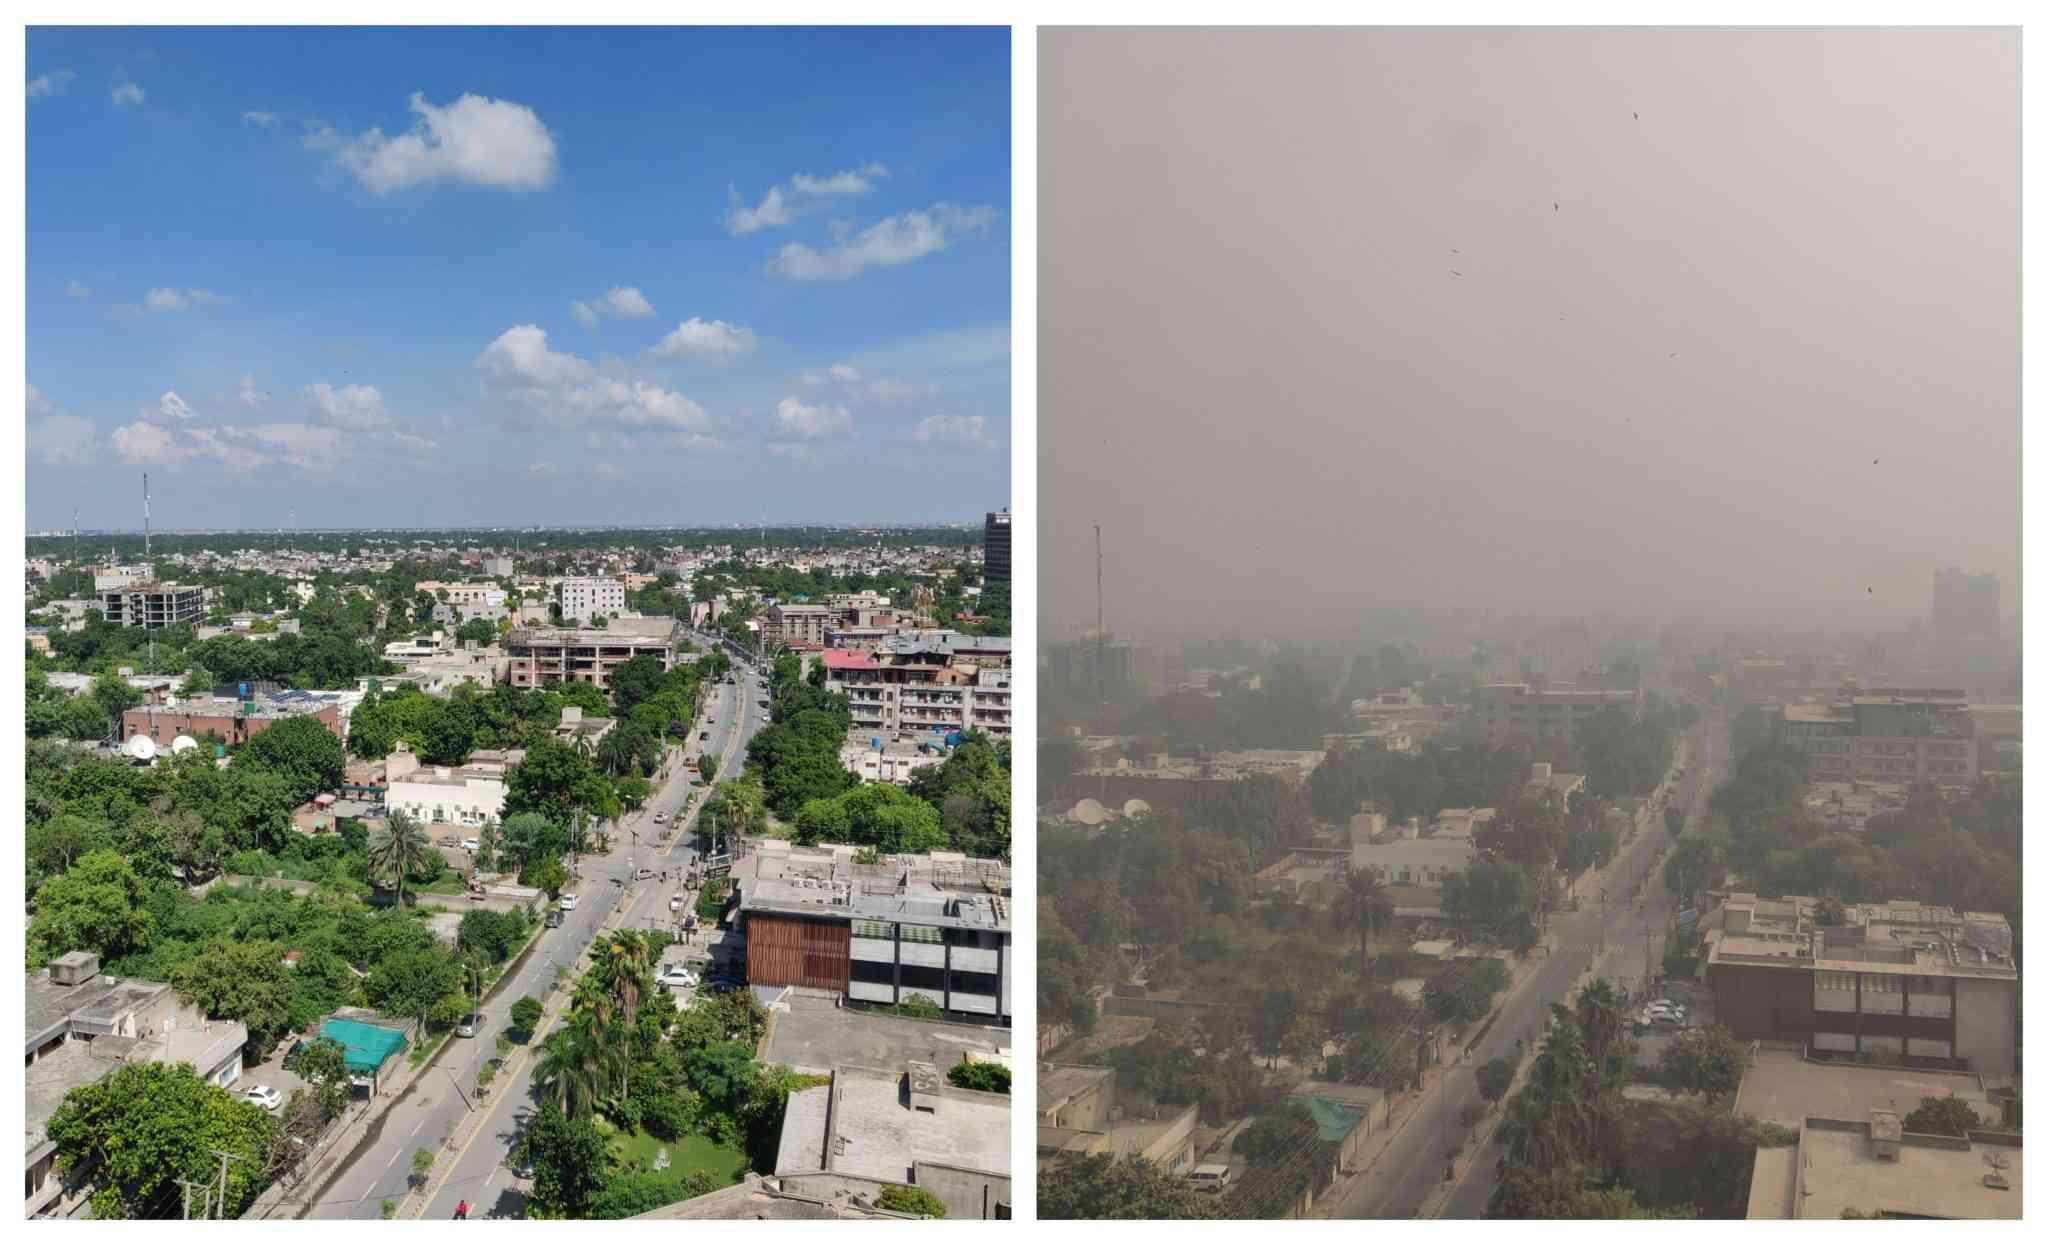 As smog engulfs Lahore, authorities in Pakistan blame India